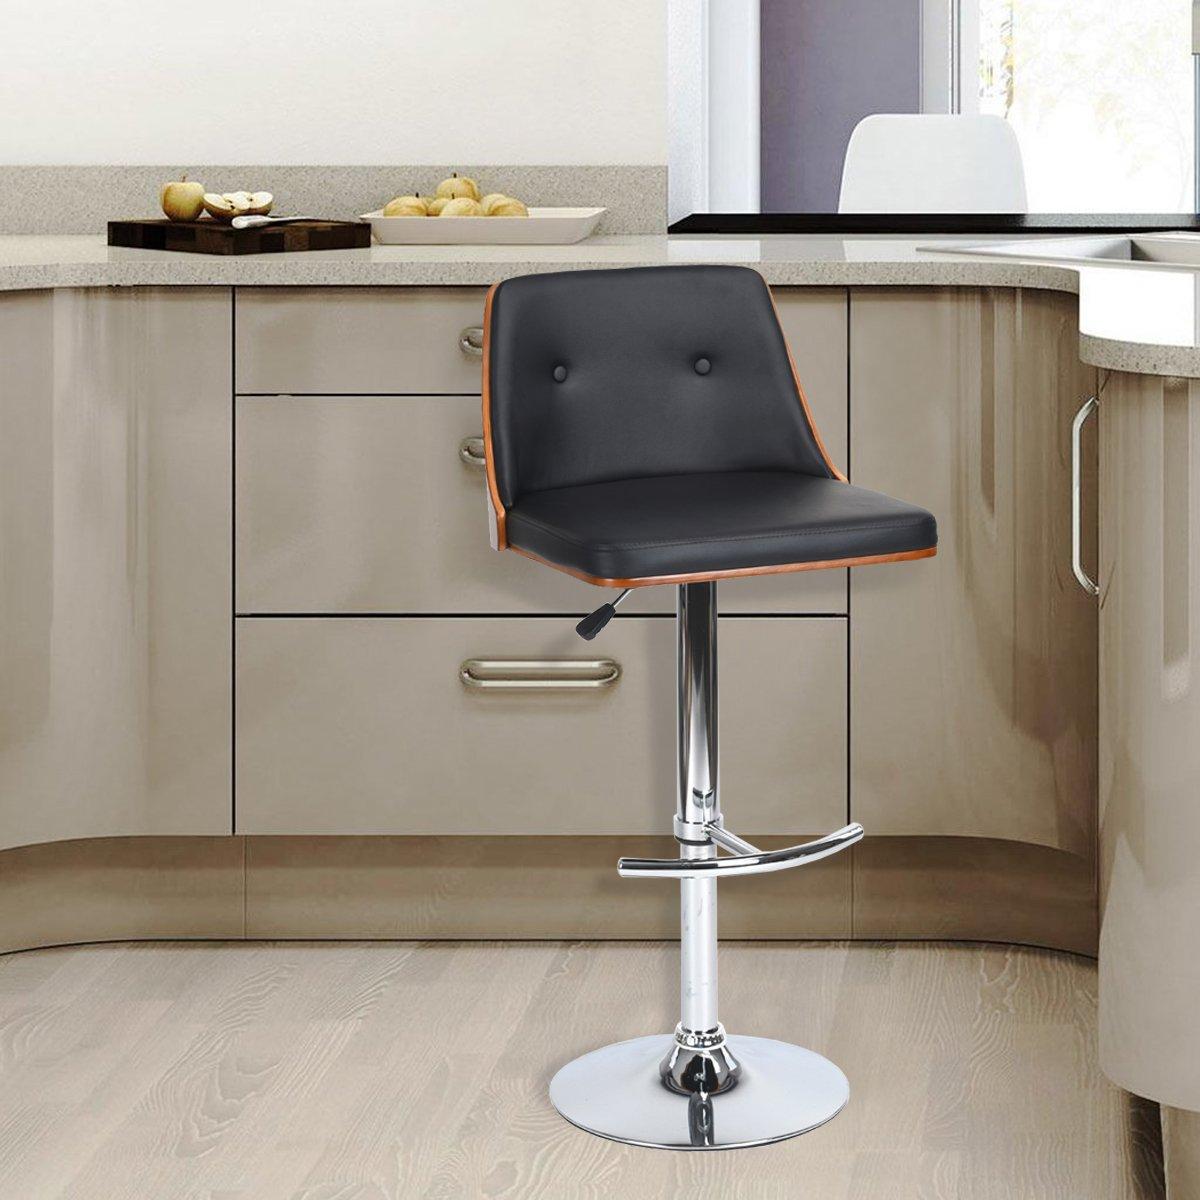 Magnificent Galleon Coavas Wohomo Swivel Barstool Adjustable Bar Short Links Chair Design For Home Short Linksinfo